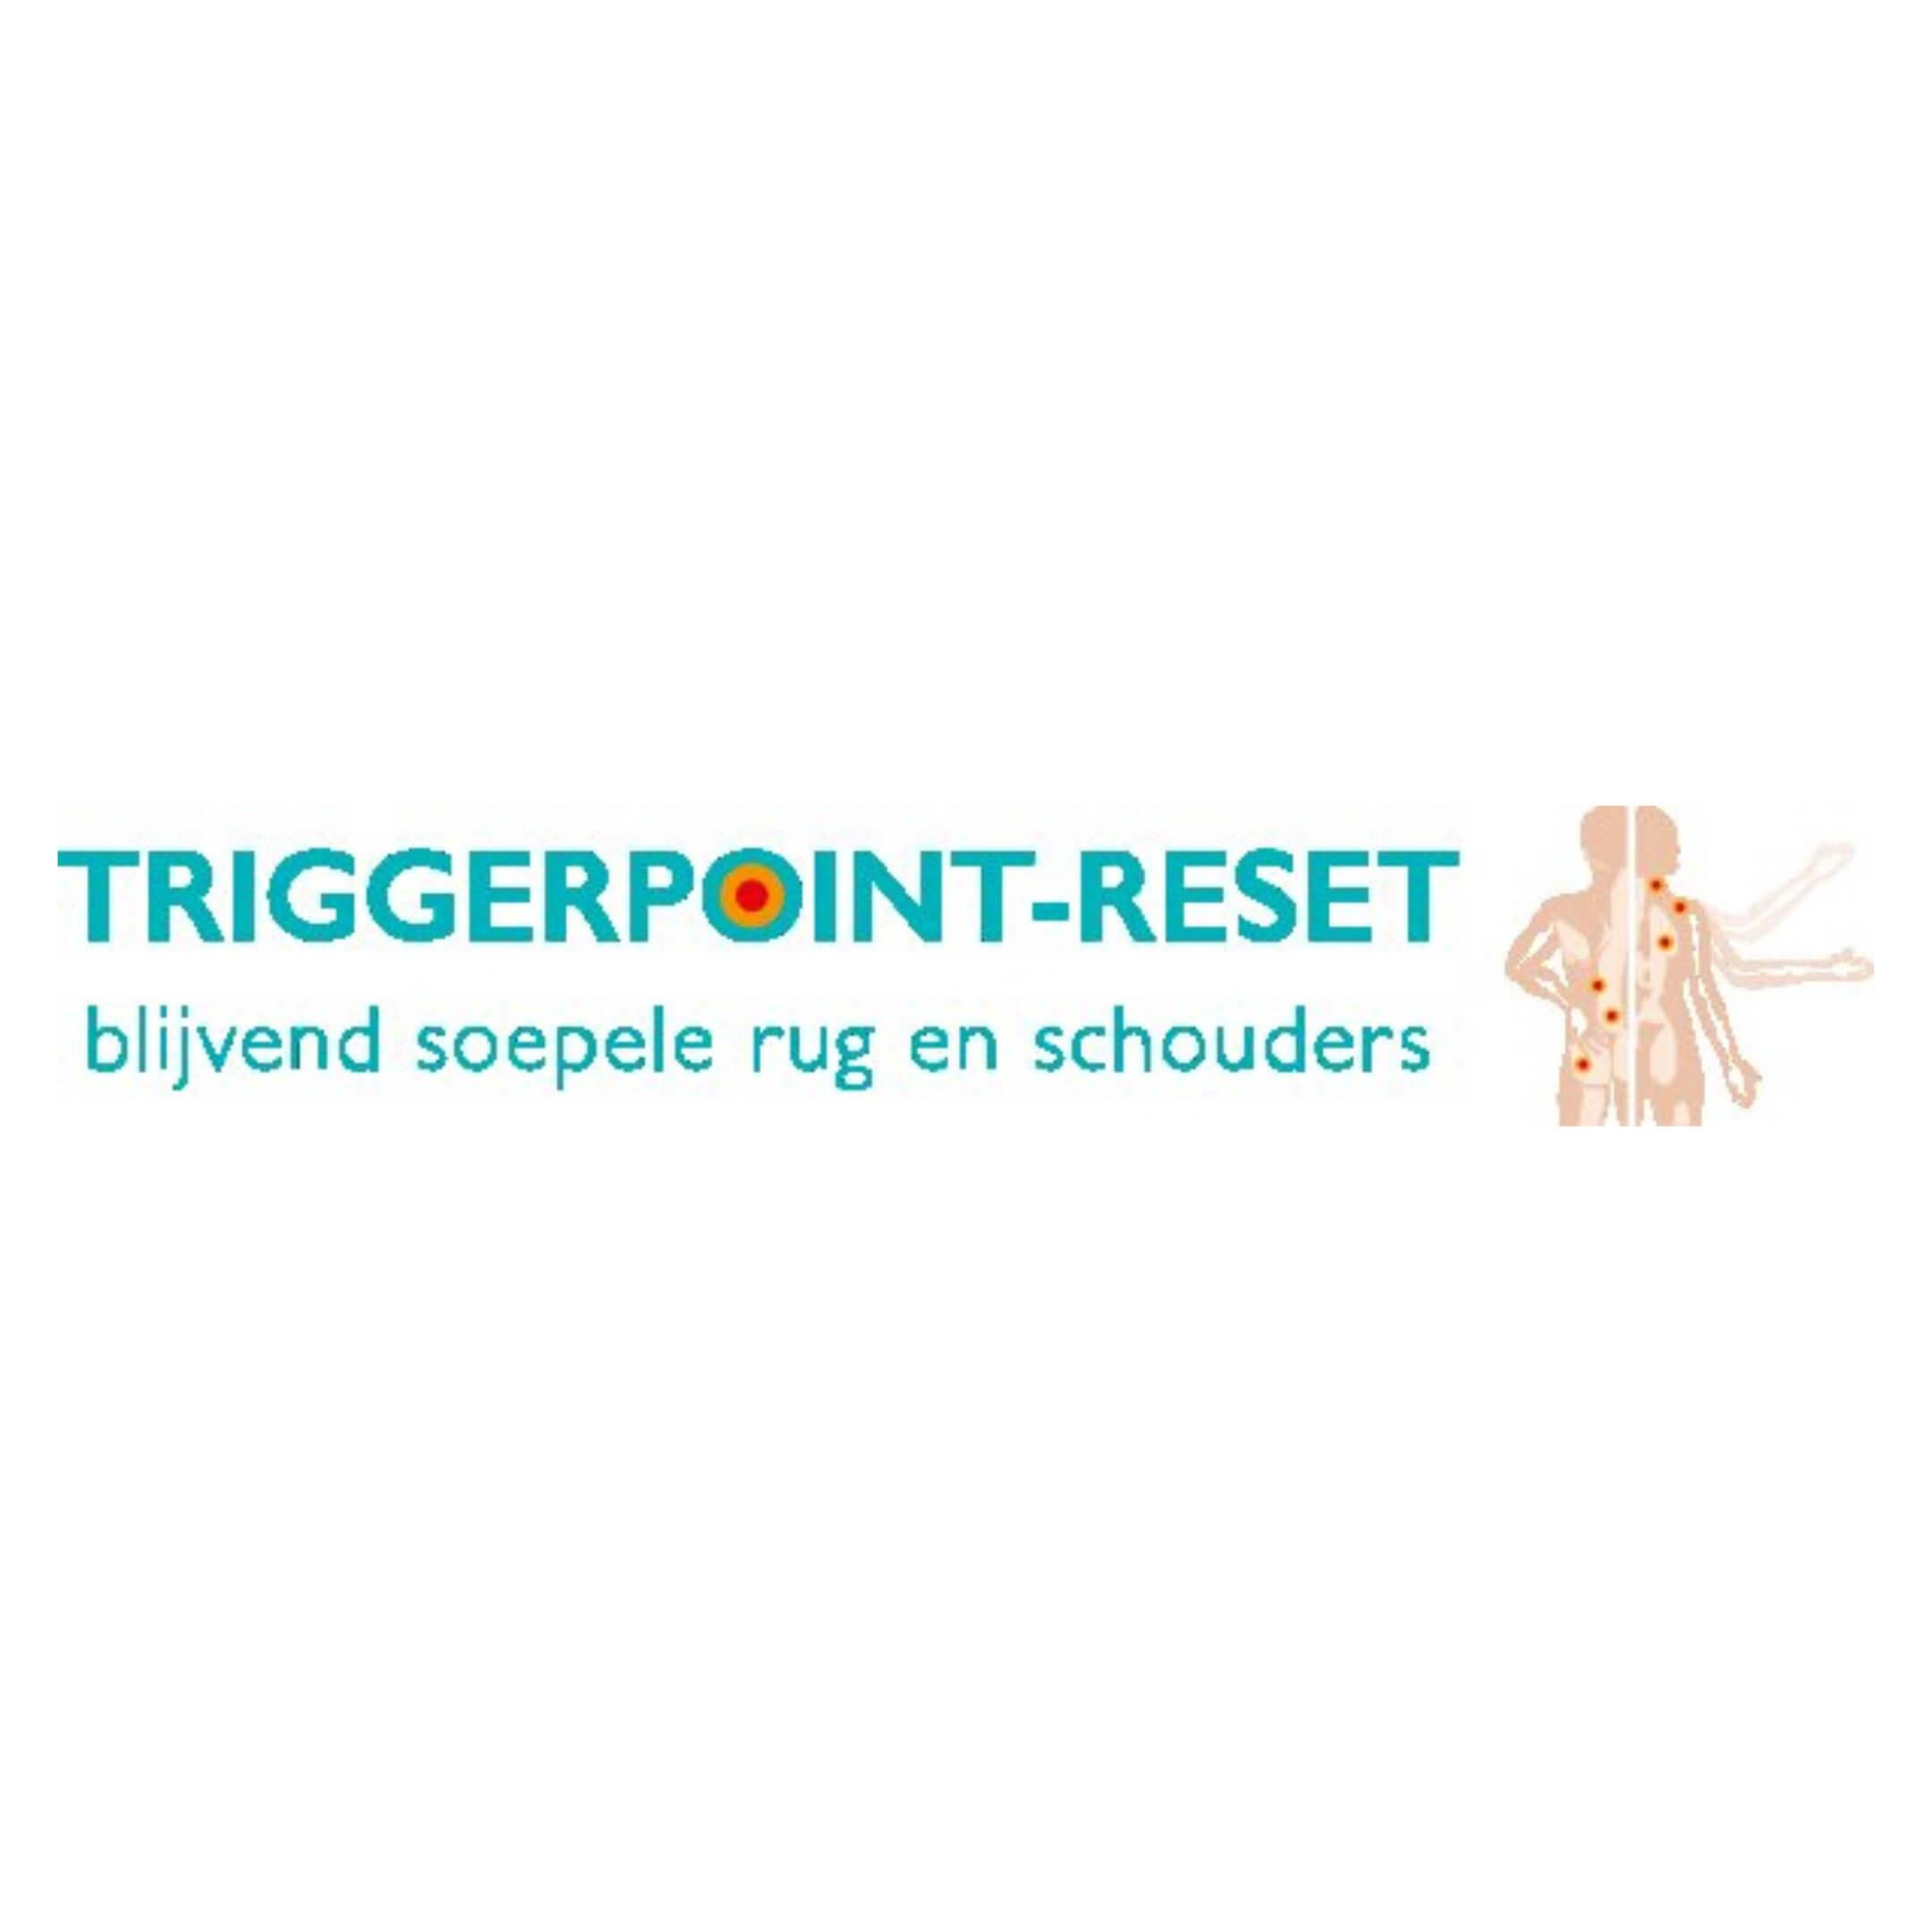 Triggerpoint-reset